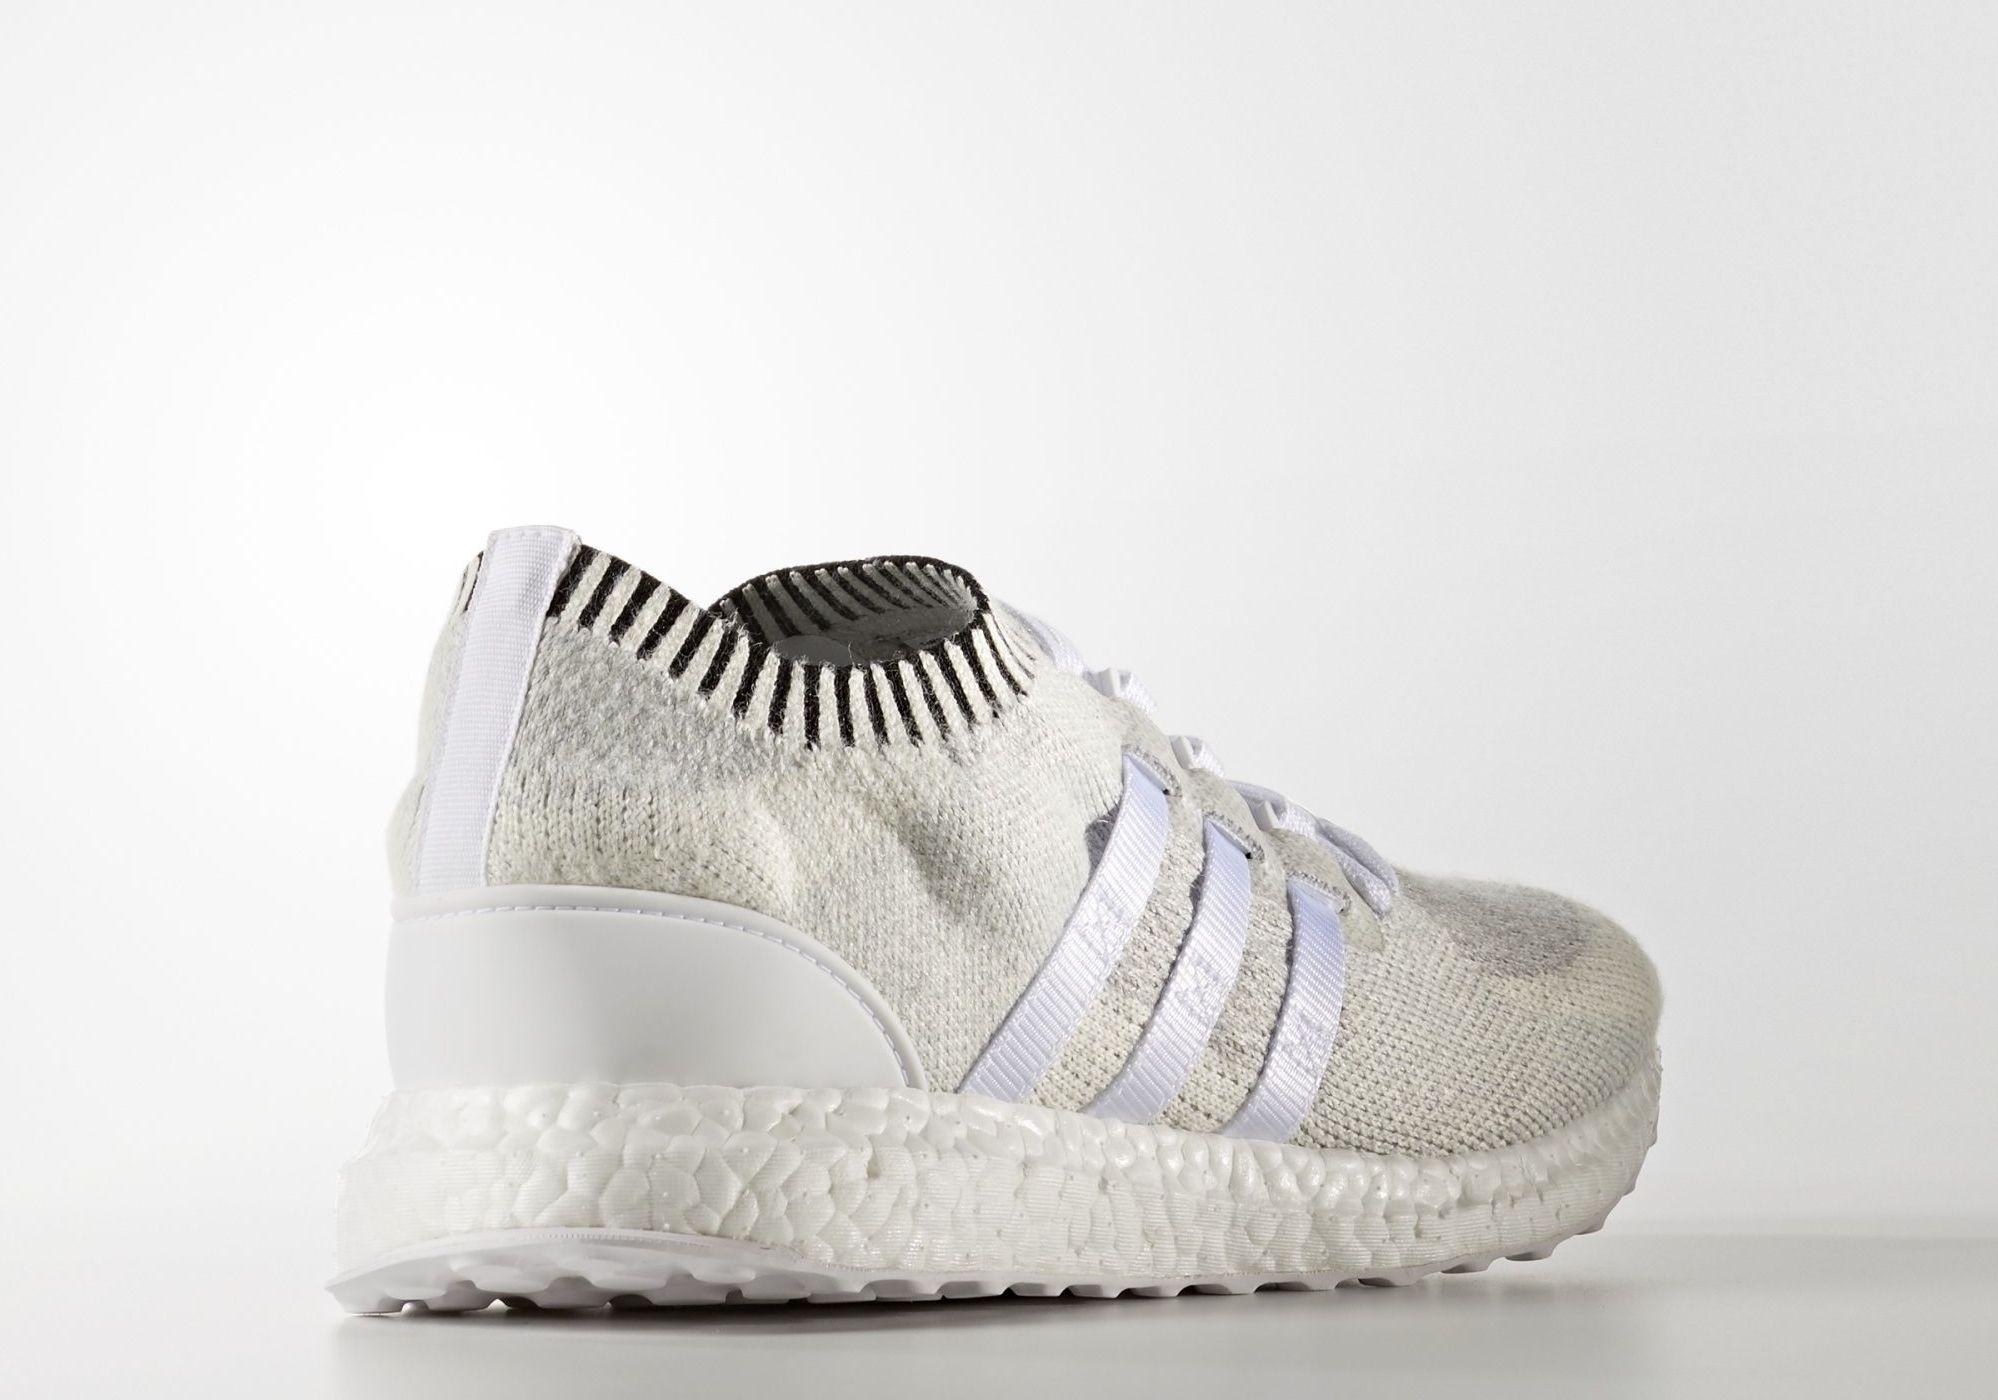 Adidas EQT Support Ultra Boost – Heel